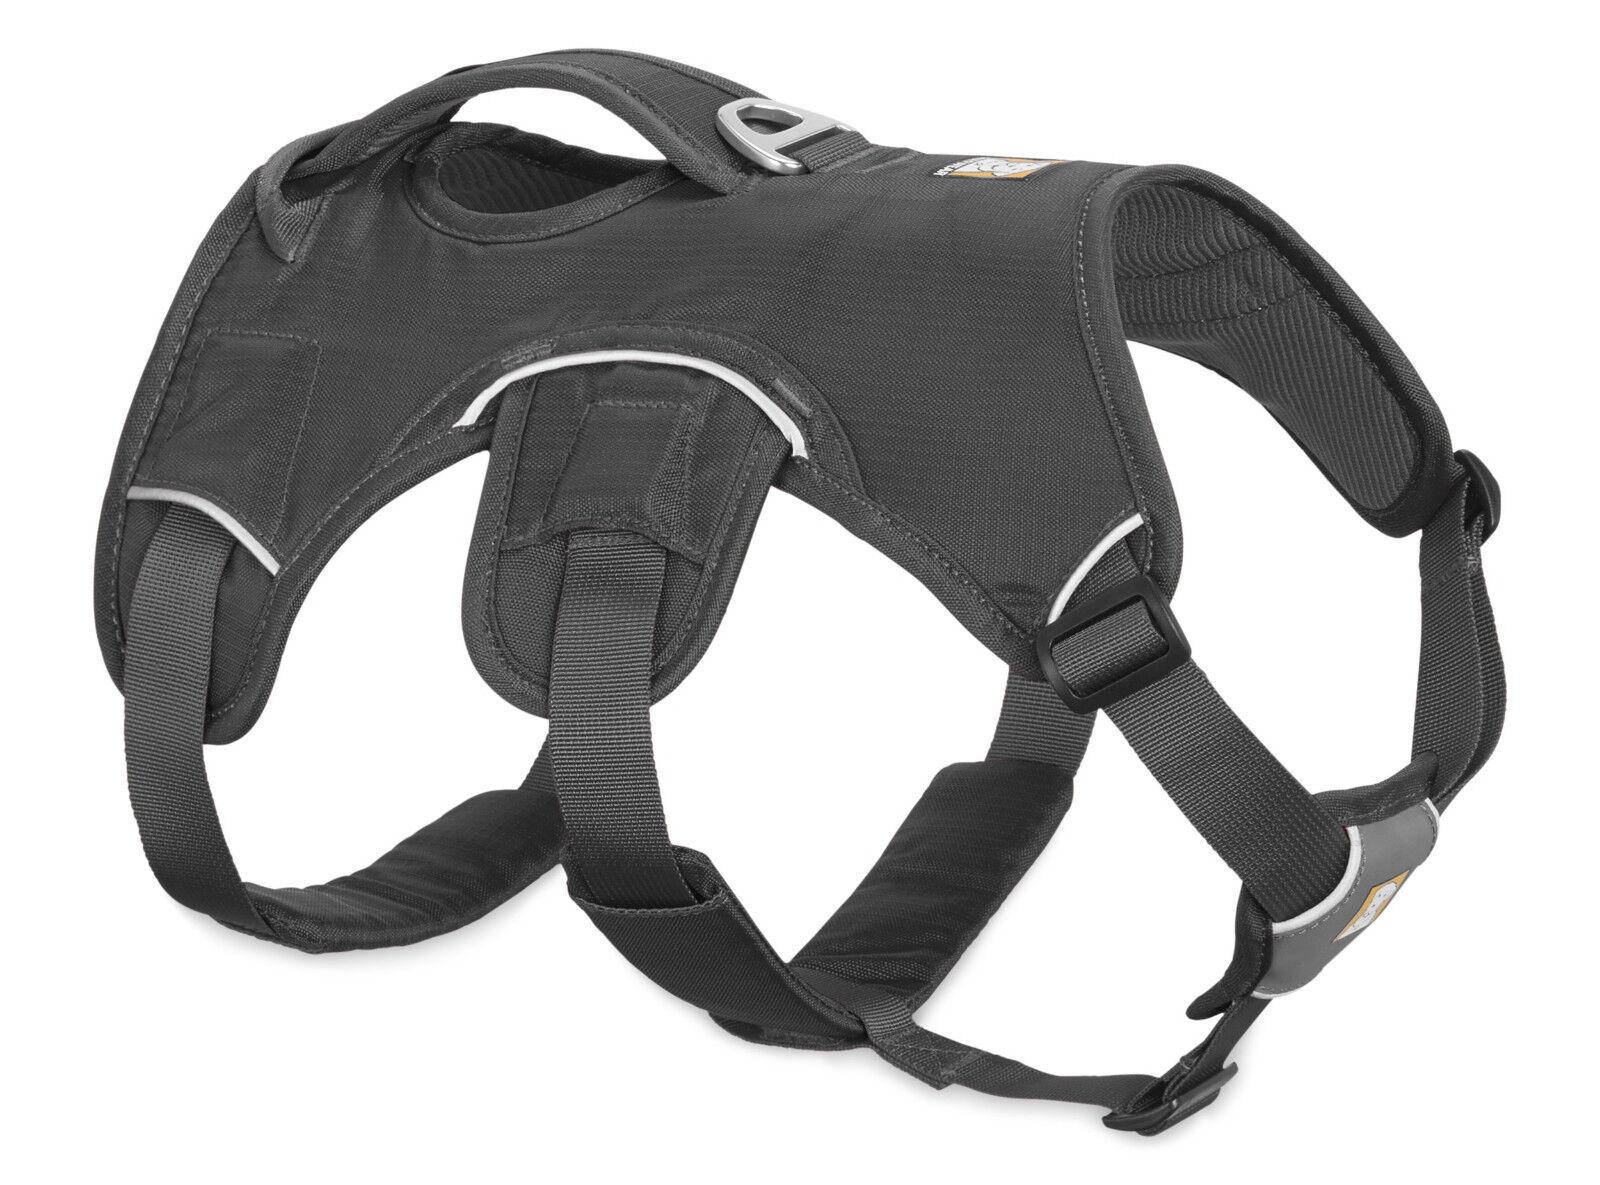 Ruffwear Web Master Dog Harness 30102 025 Twilight grau NEW